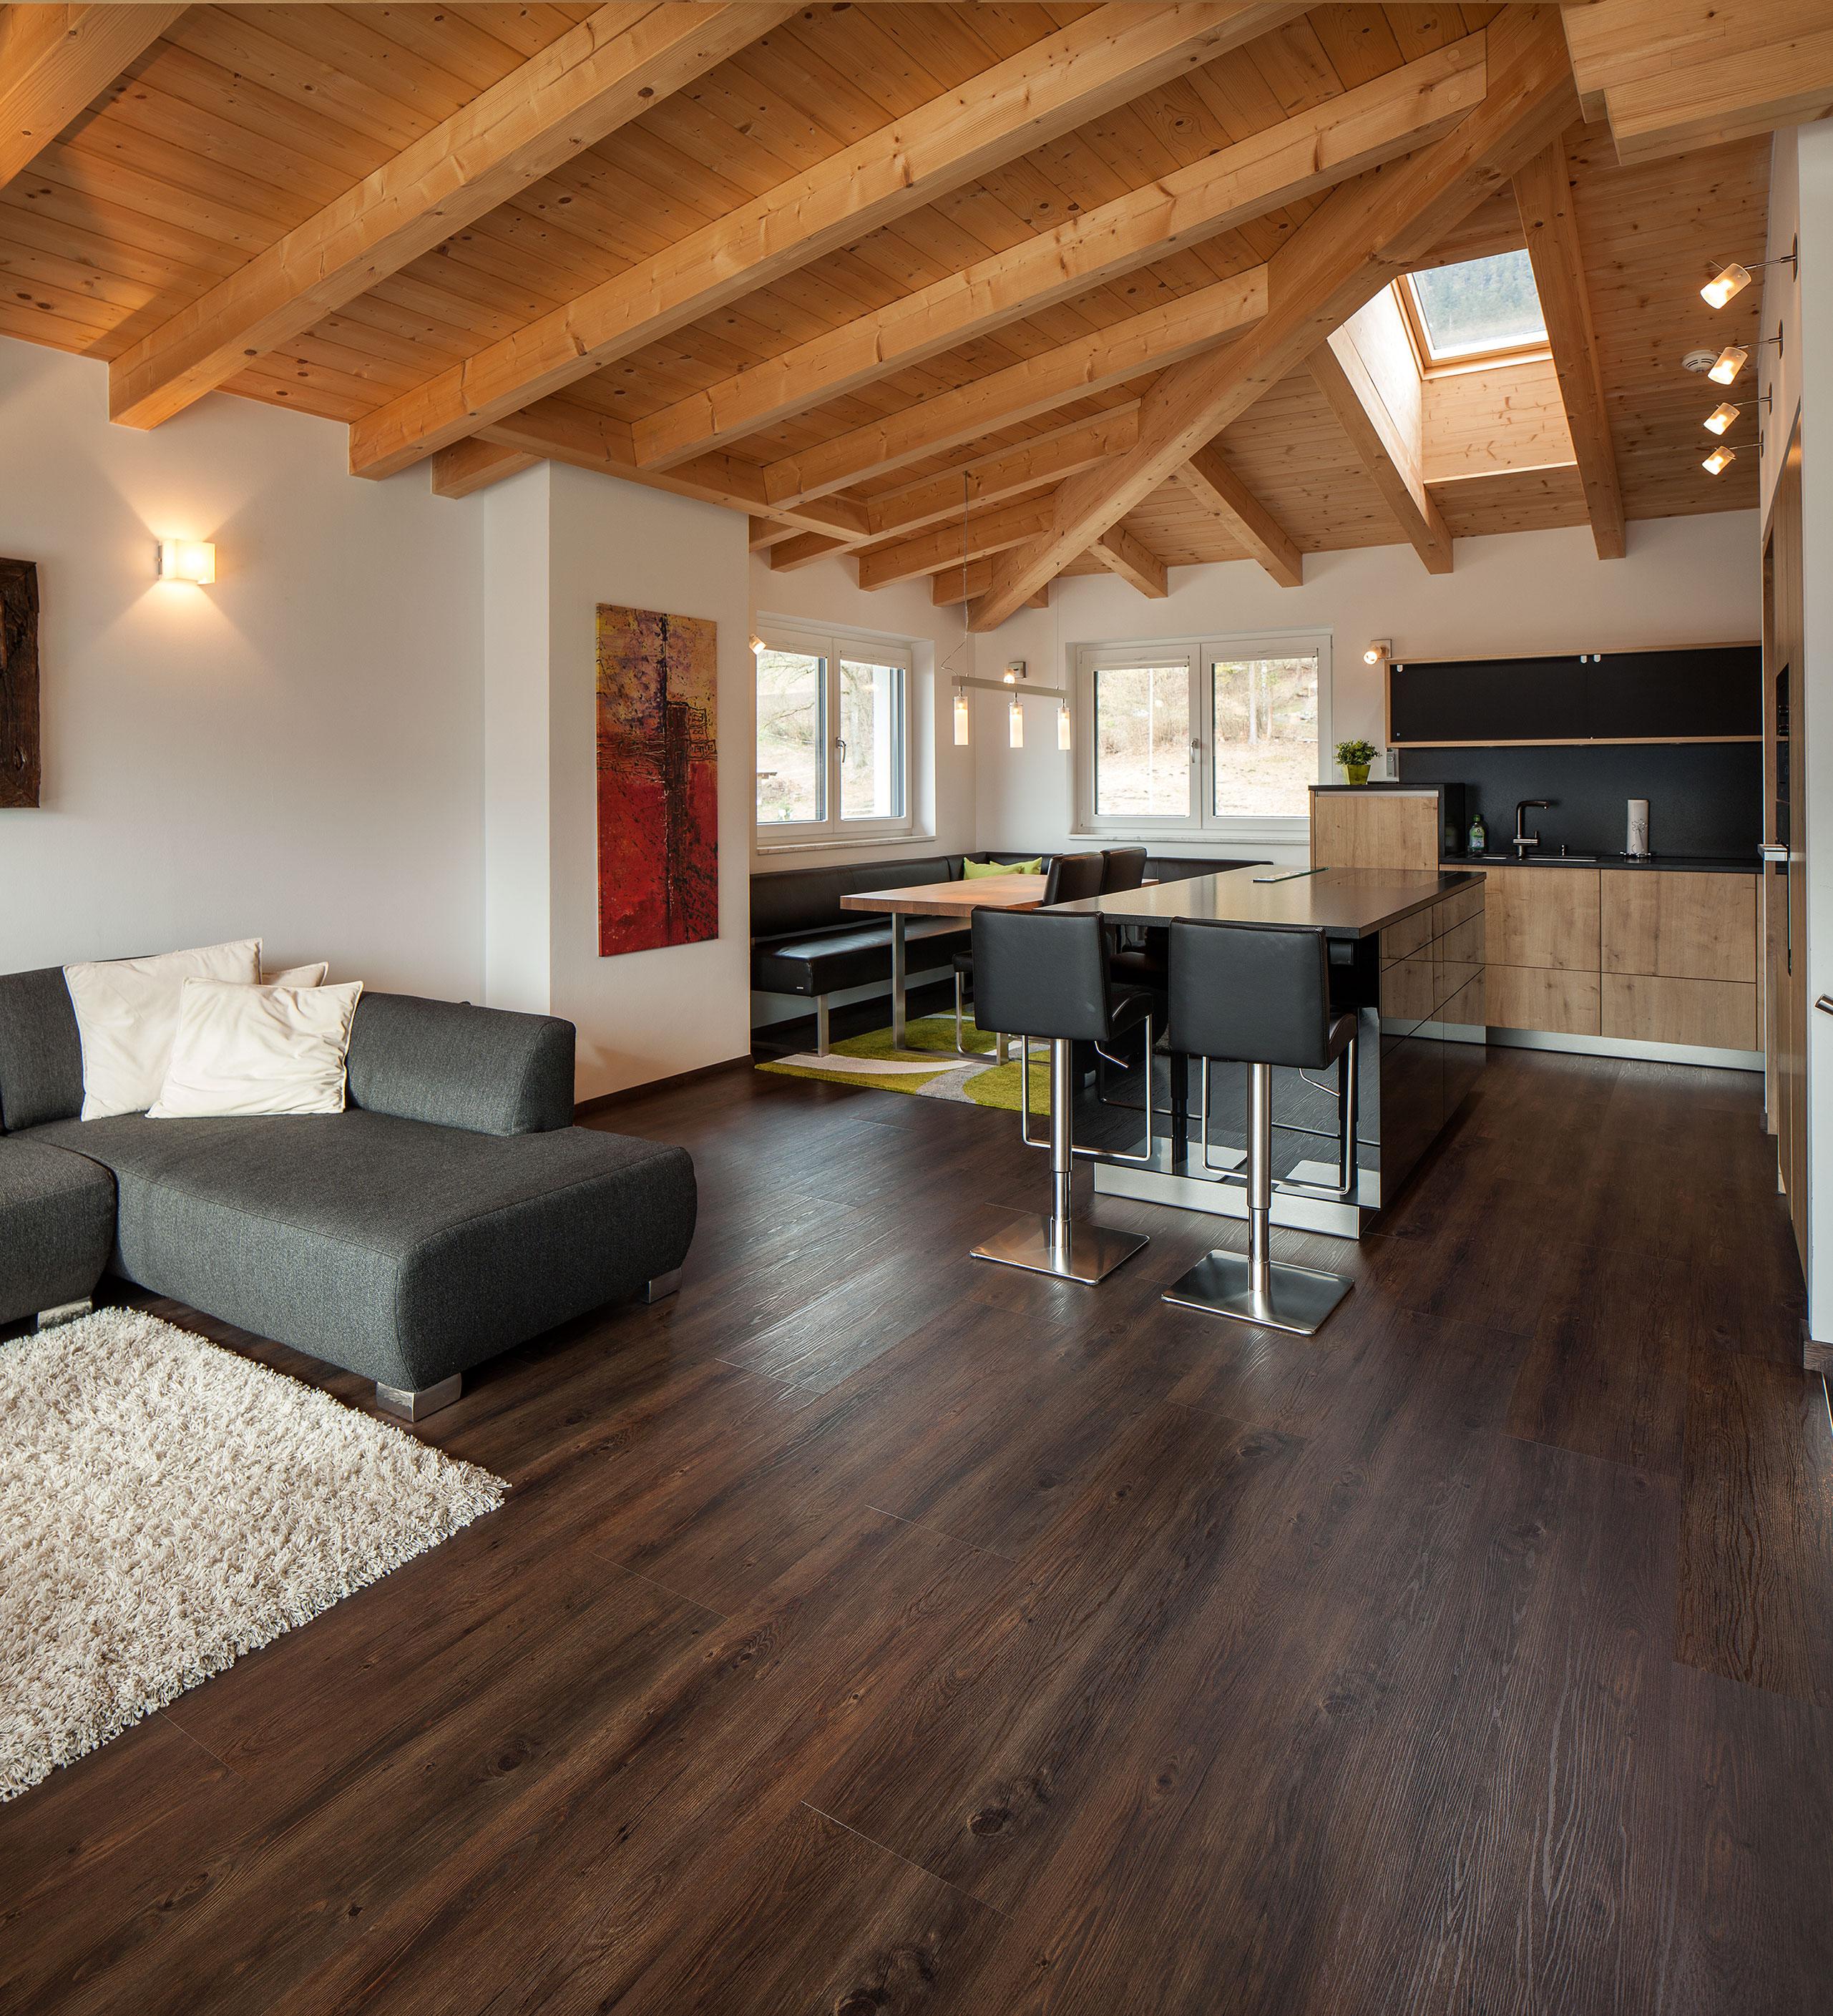 vinylbelag pronto economy plus eiche dunkel rustikal wohnemotion parkett und naturb den. Black Bedroom Furniture Sets. Home Design Ideas